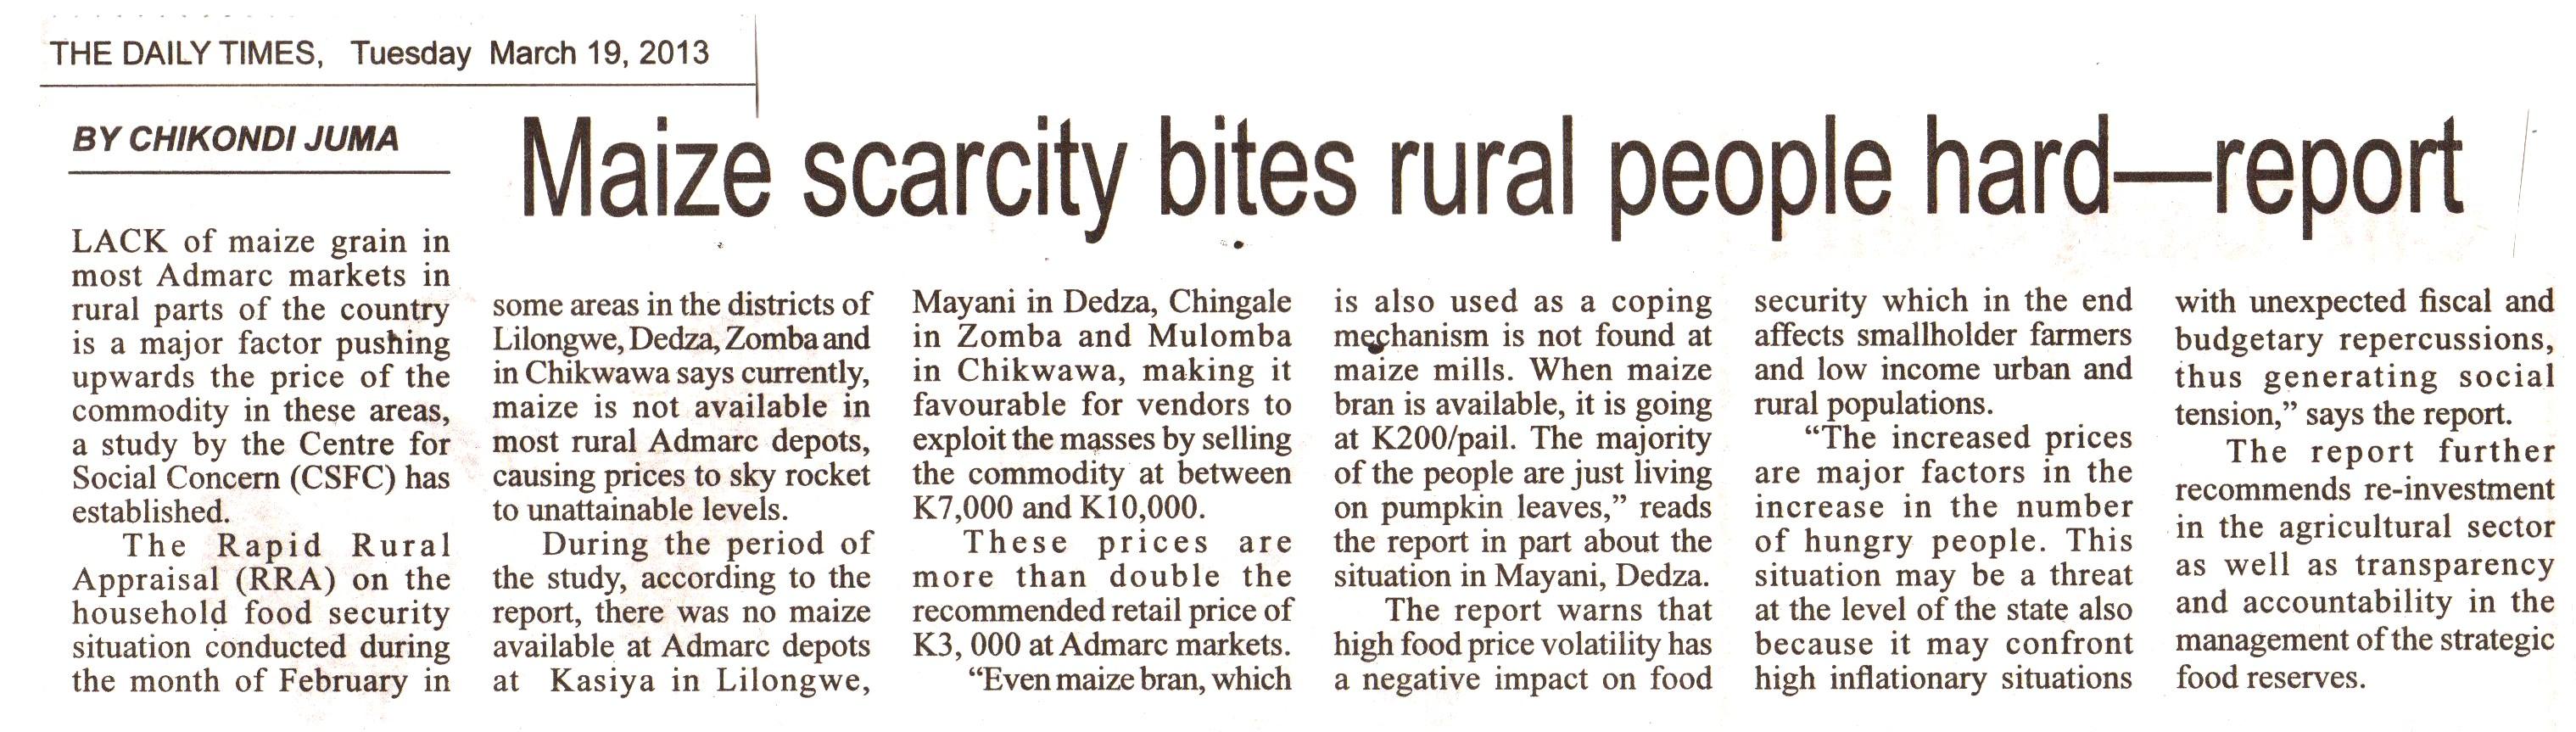 Maize scacity bites rural population